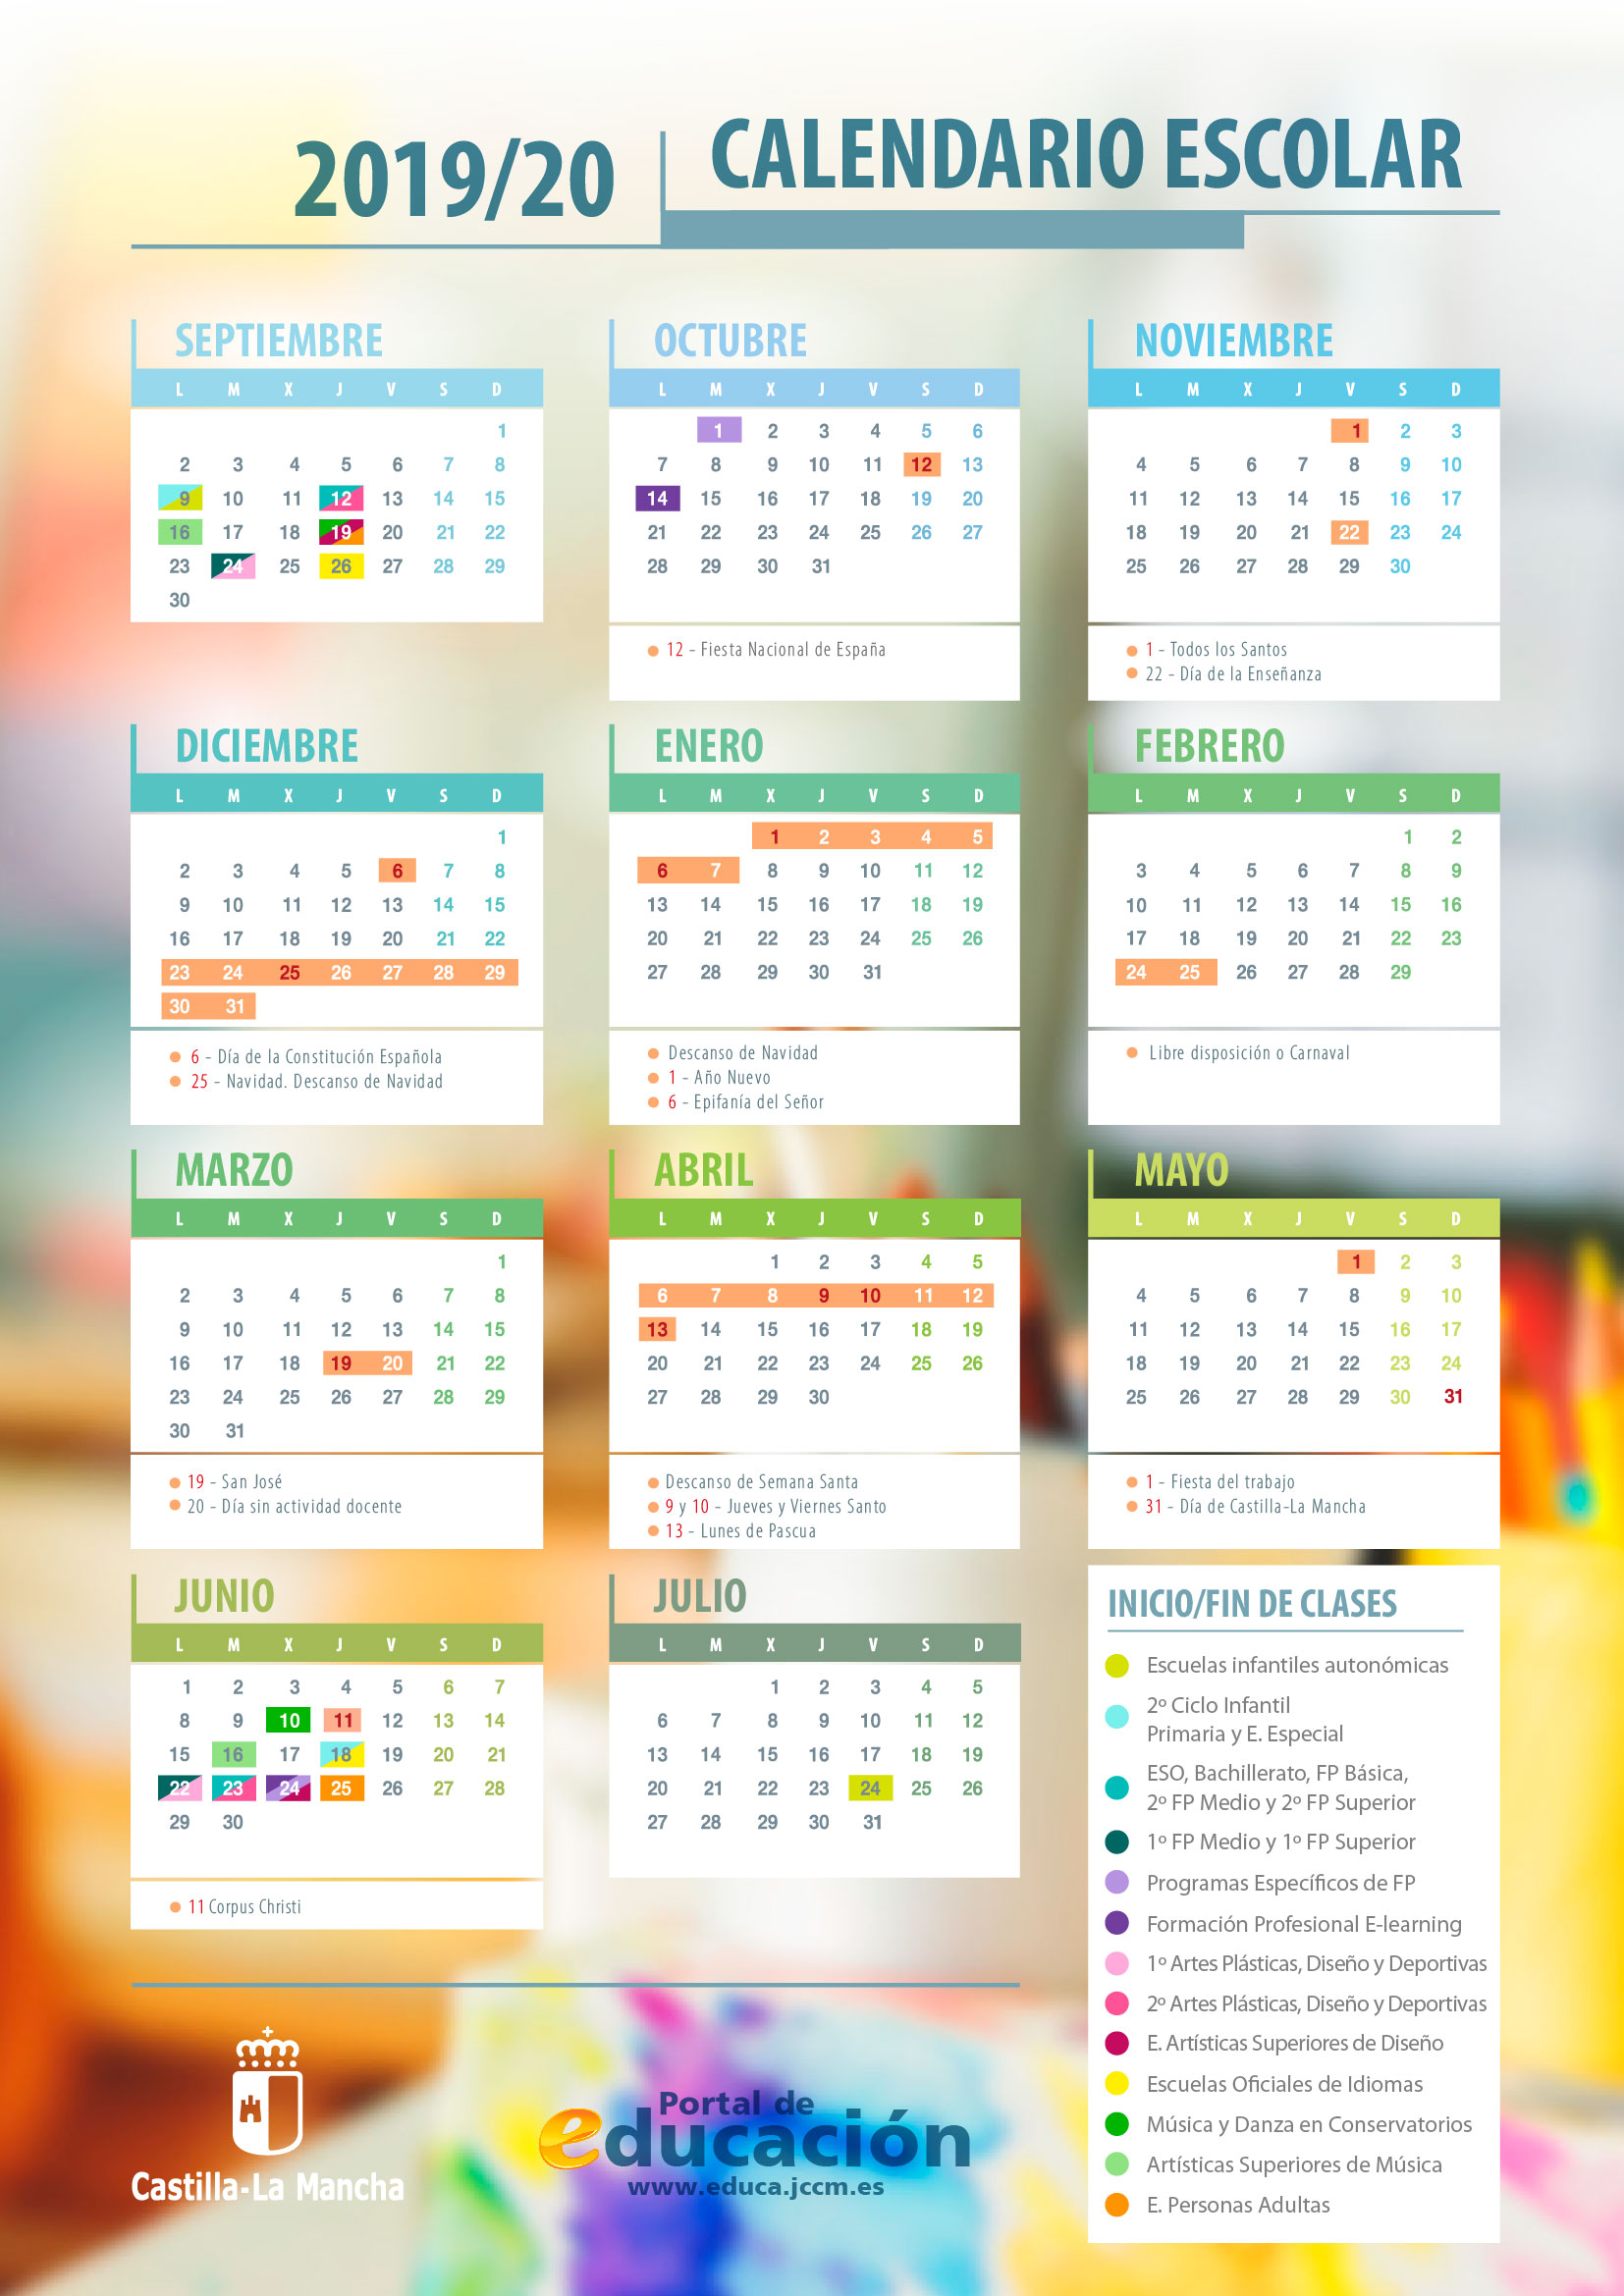 Calendario escolar Castilla-La Mancha 2019/2020